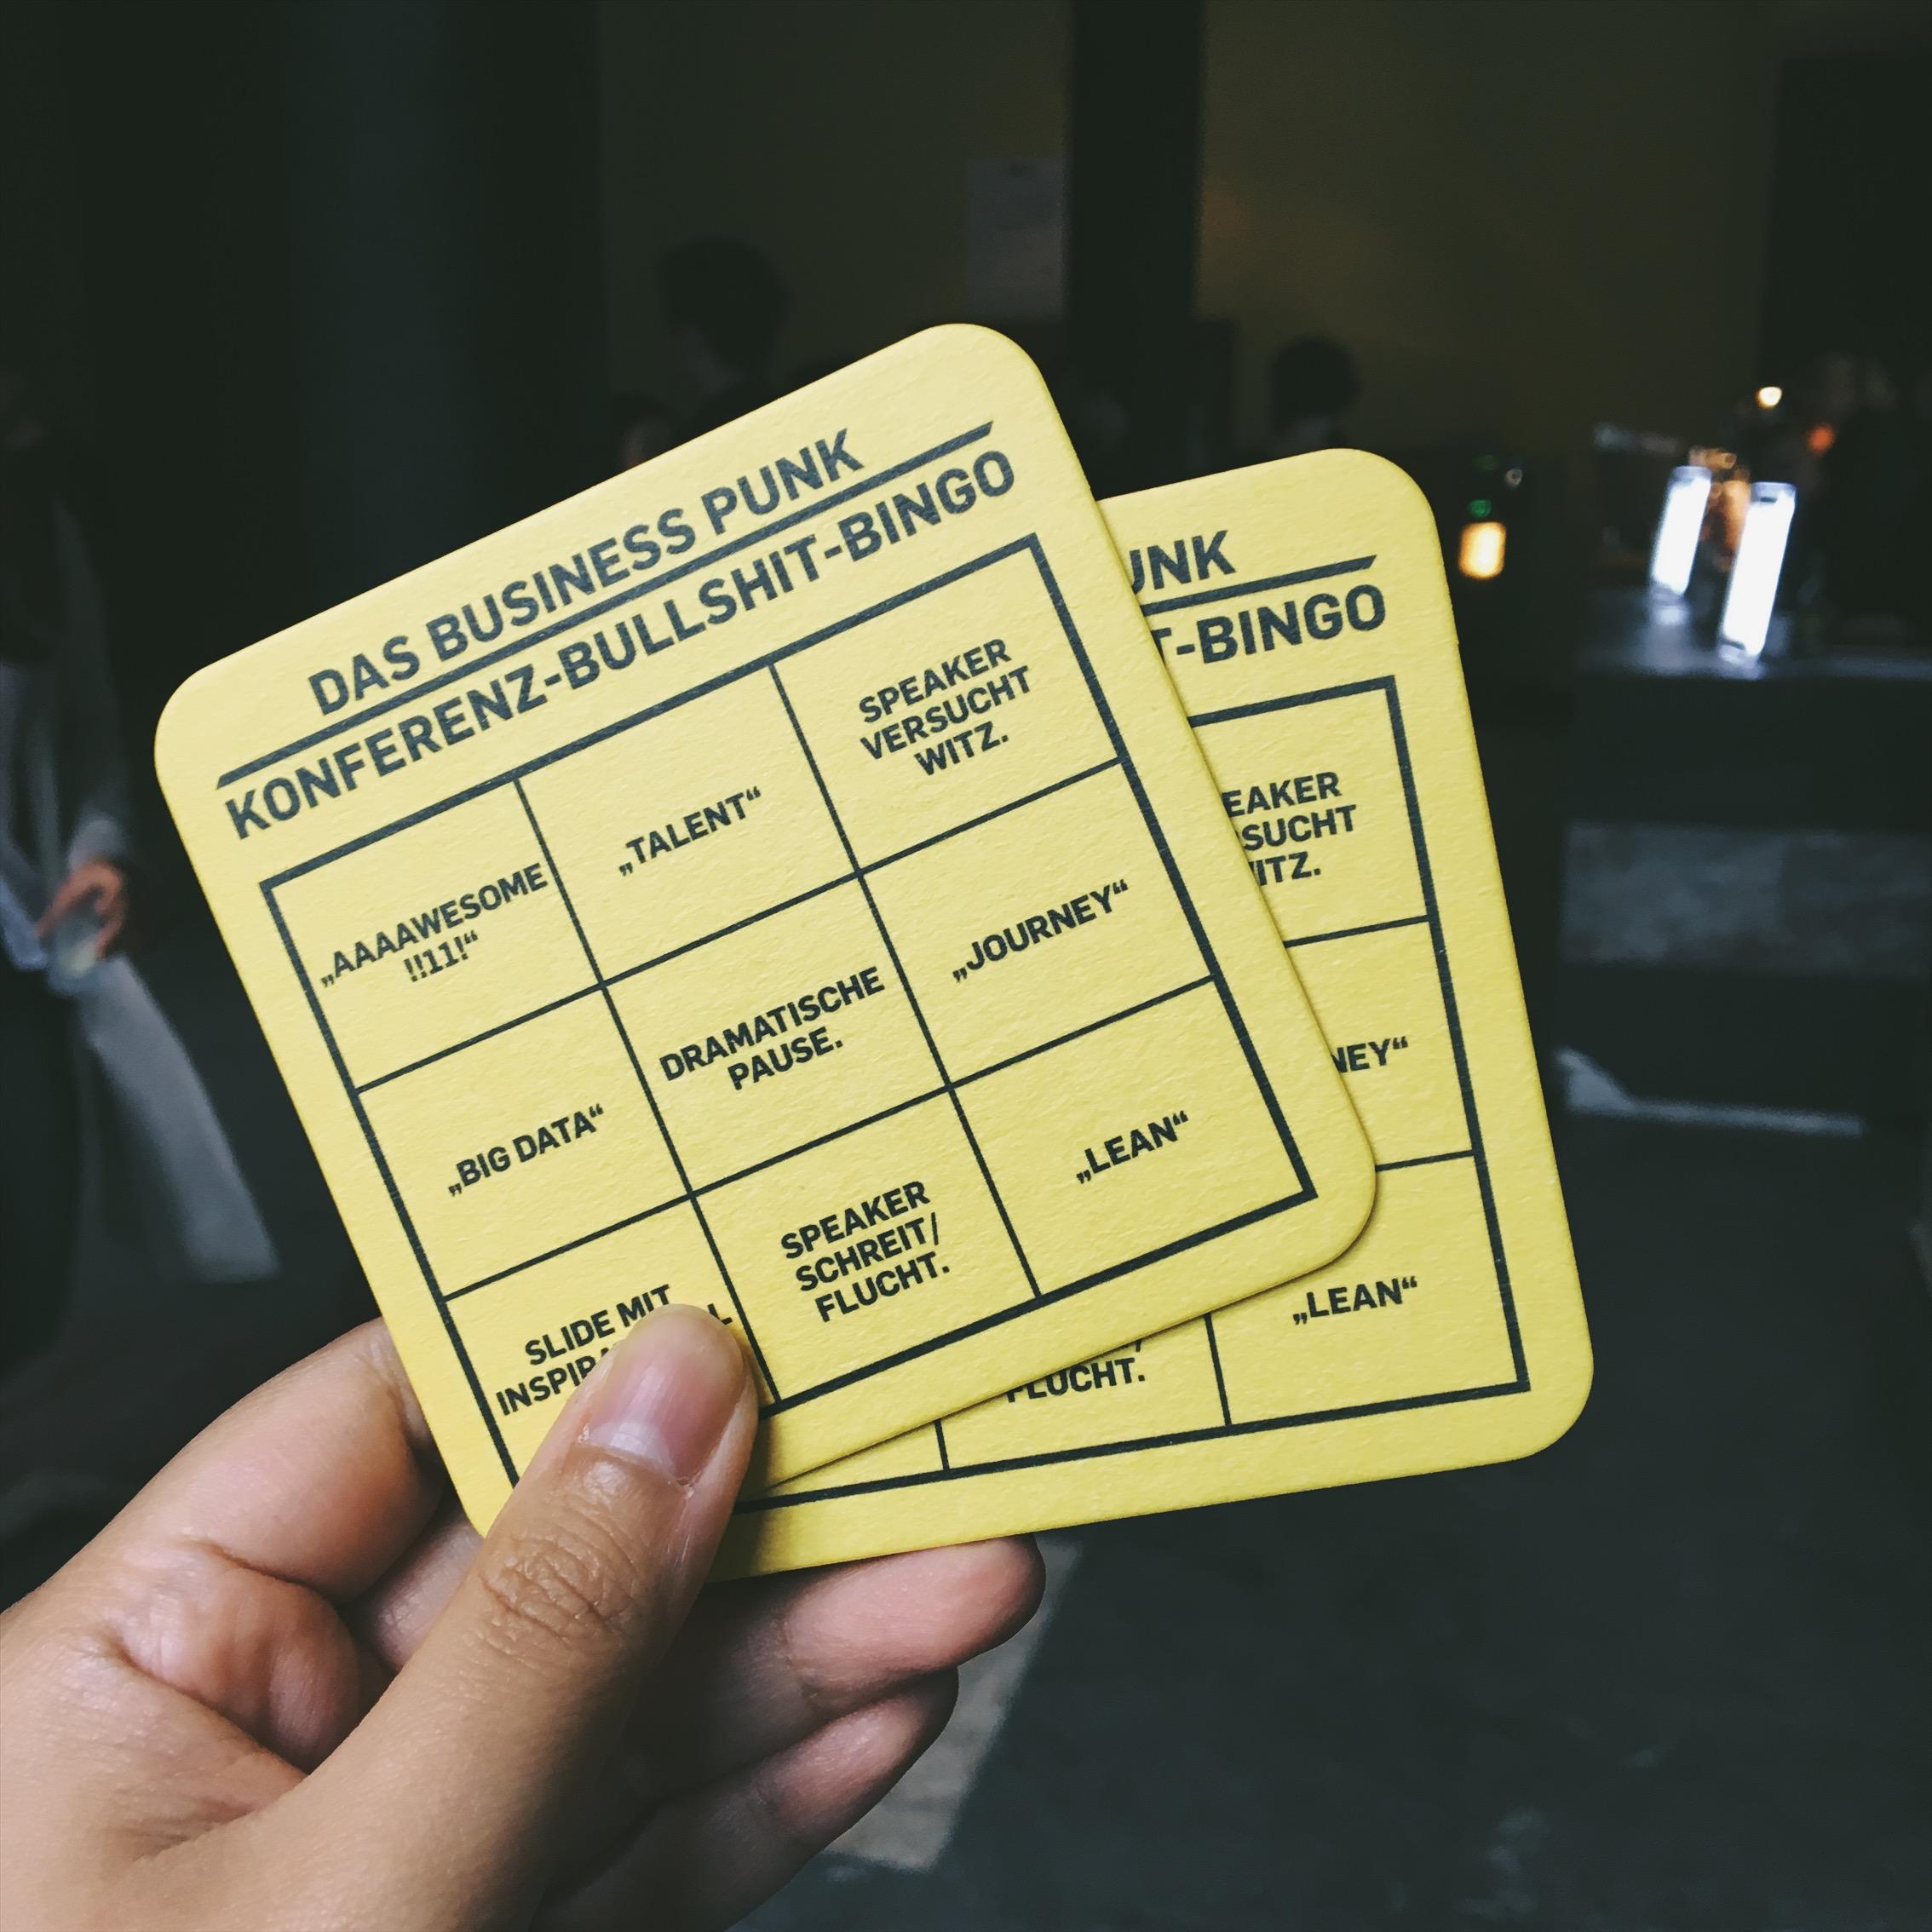 Small bingo business card.